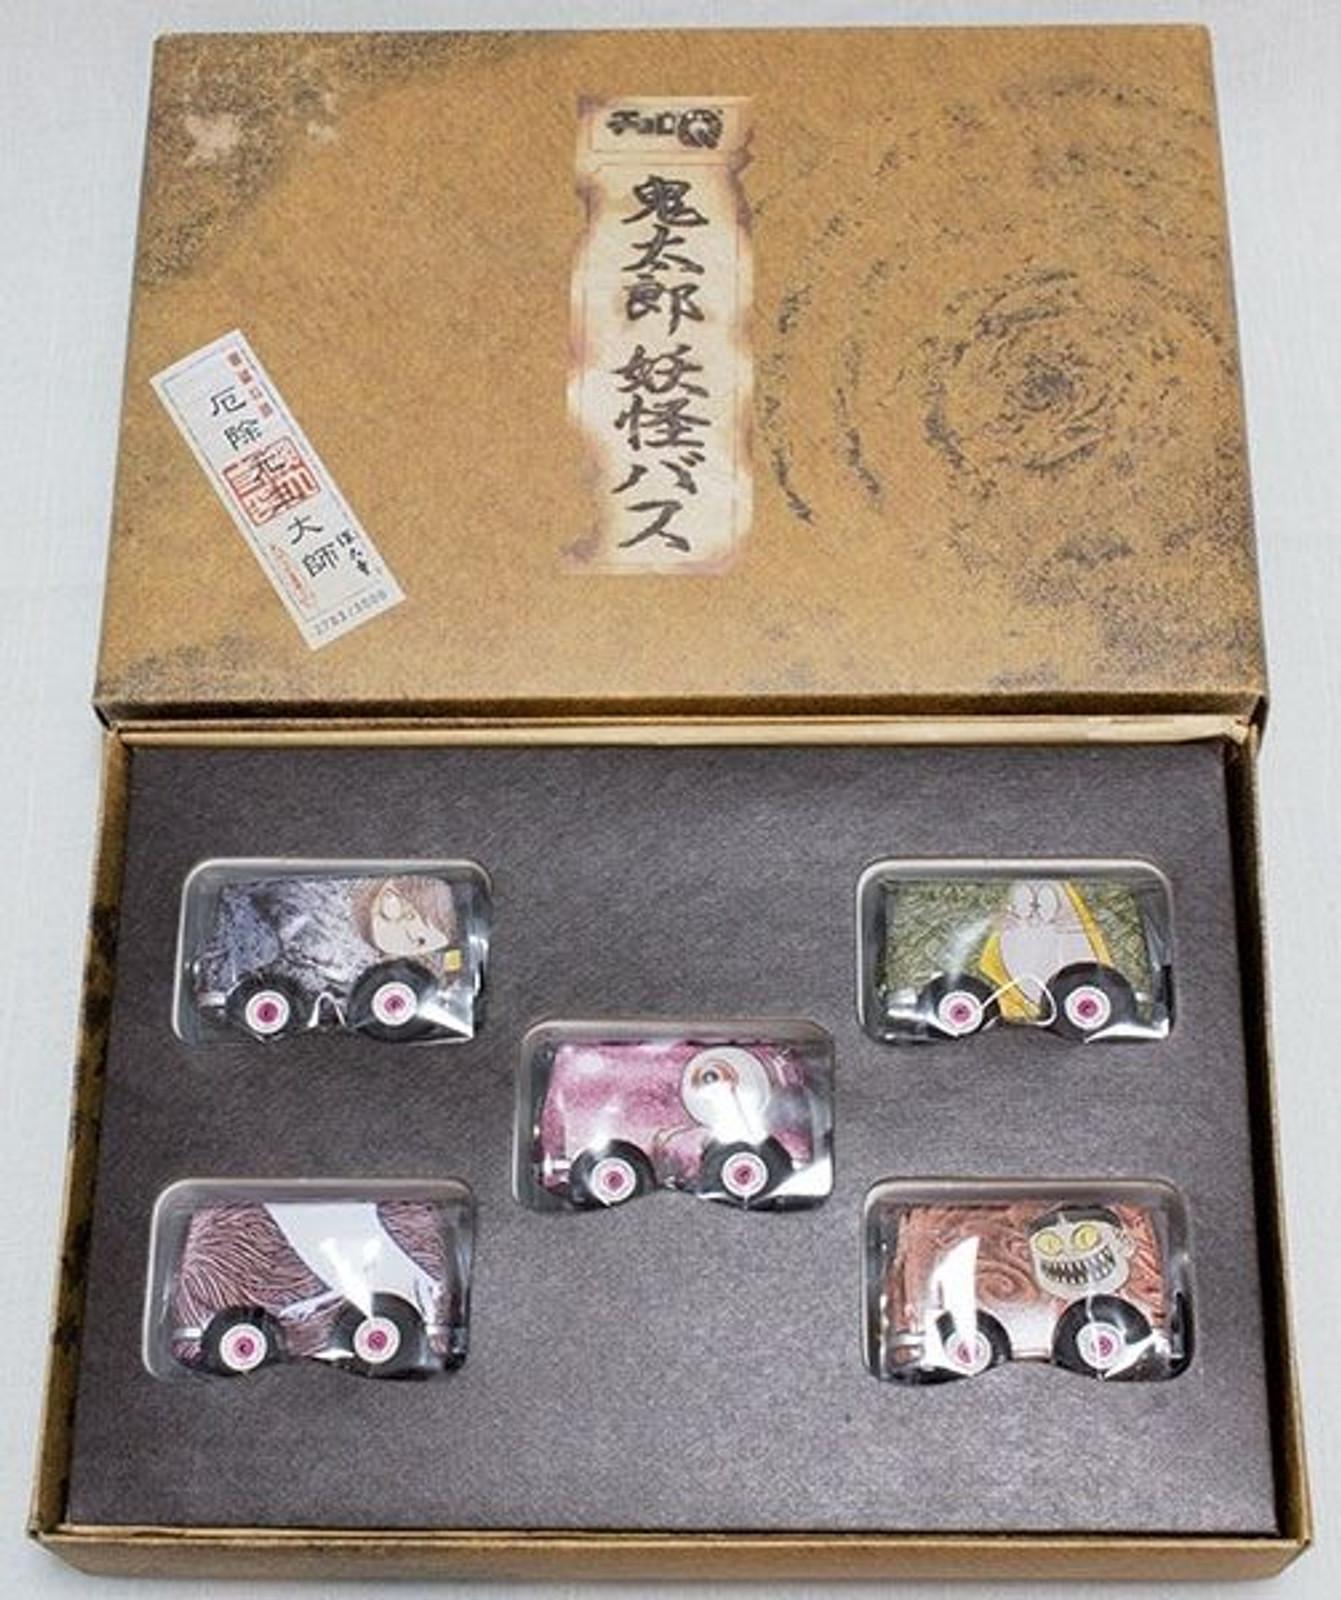 Gegege no Kitaro Choro Q Yokai Bus 5 set Limited Edition 3000 JAPAN ANIME